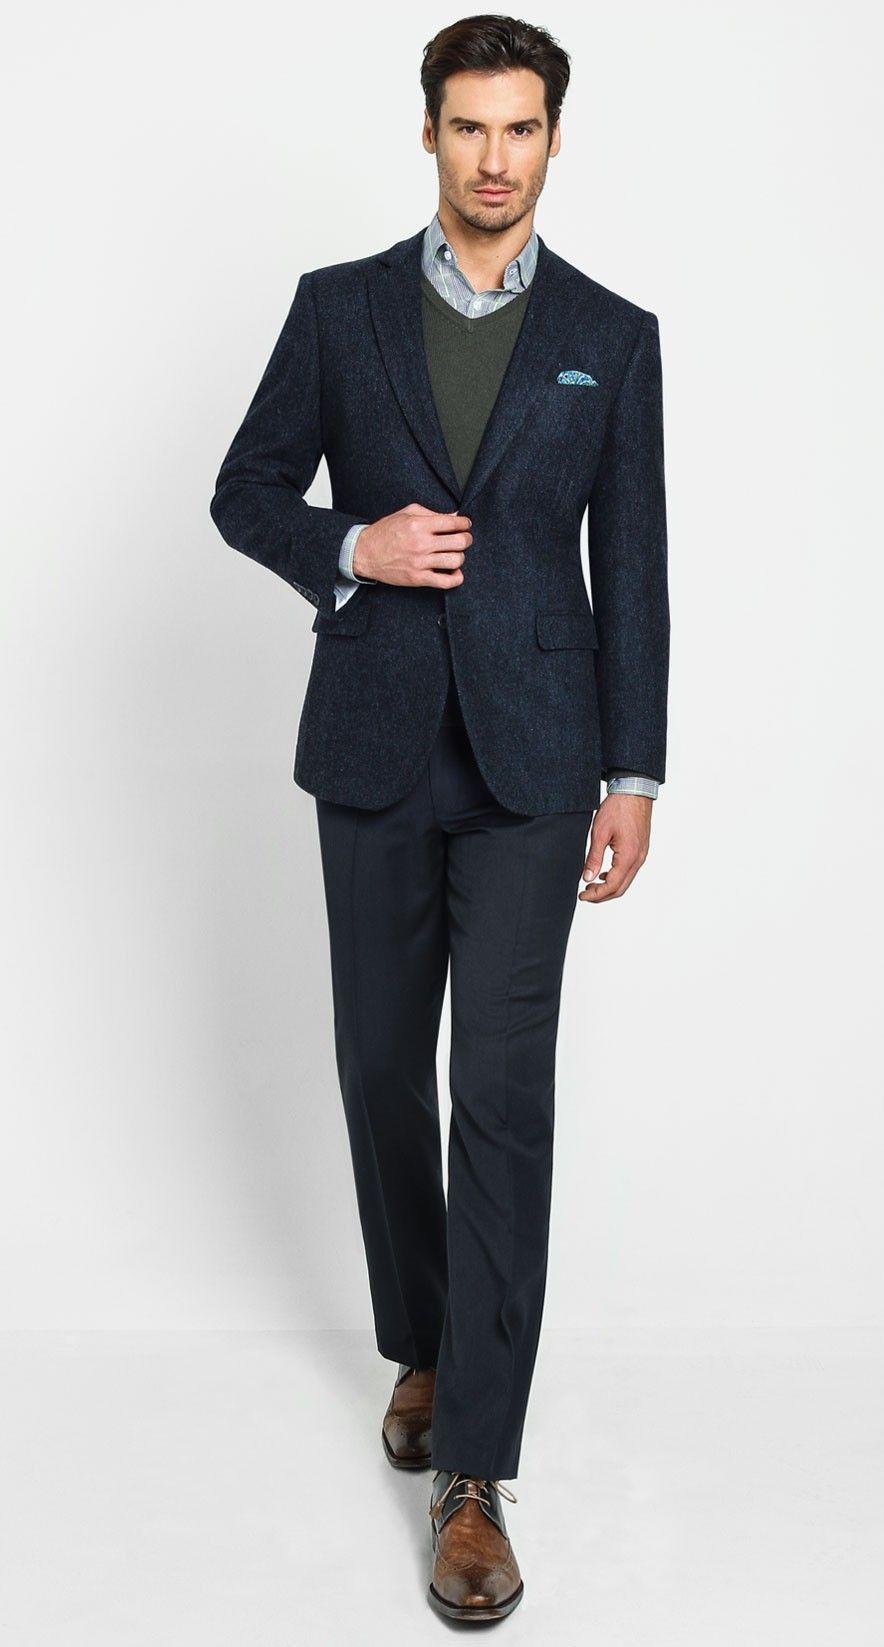 b36d6be471dd29 JT Herringbone Sportscoat - Navy | Bachrach Men's Outerwear | Mens ...